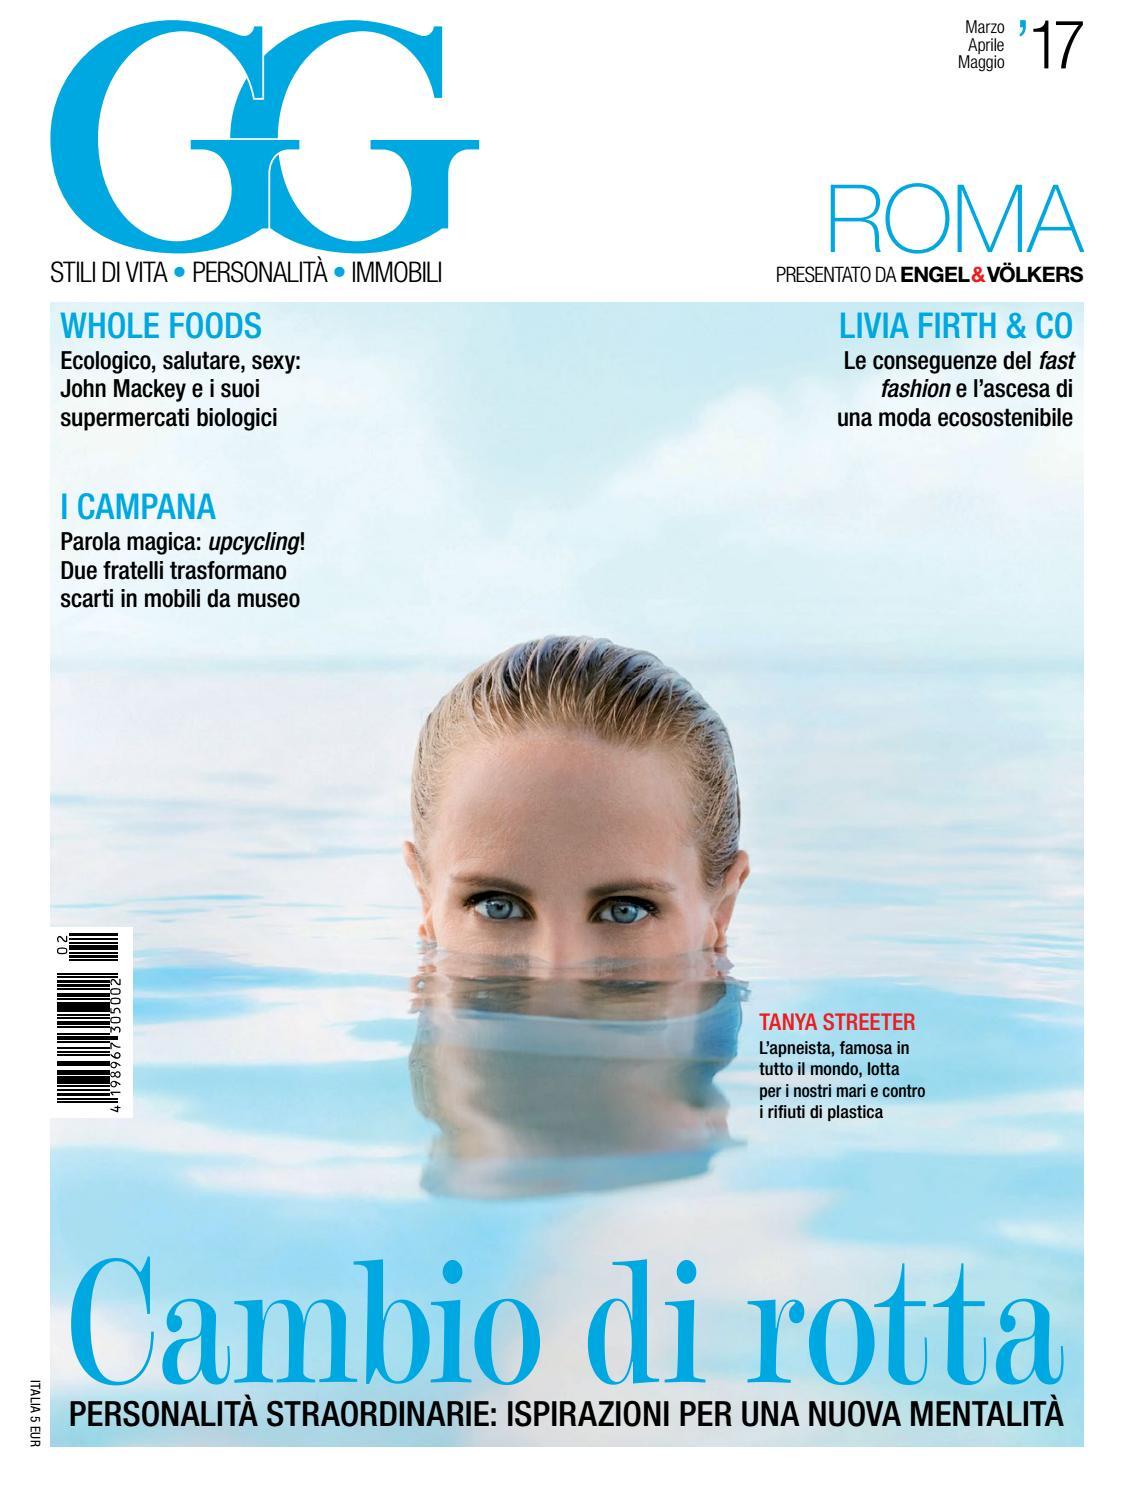 GG Magazine 02 17 Rome by GG-Magazine - issuu 2630190a5aa